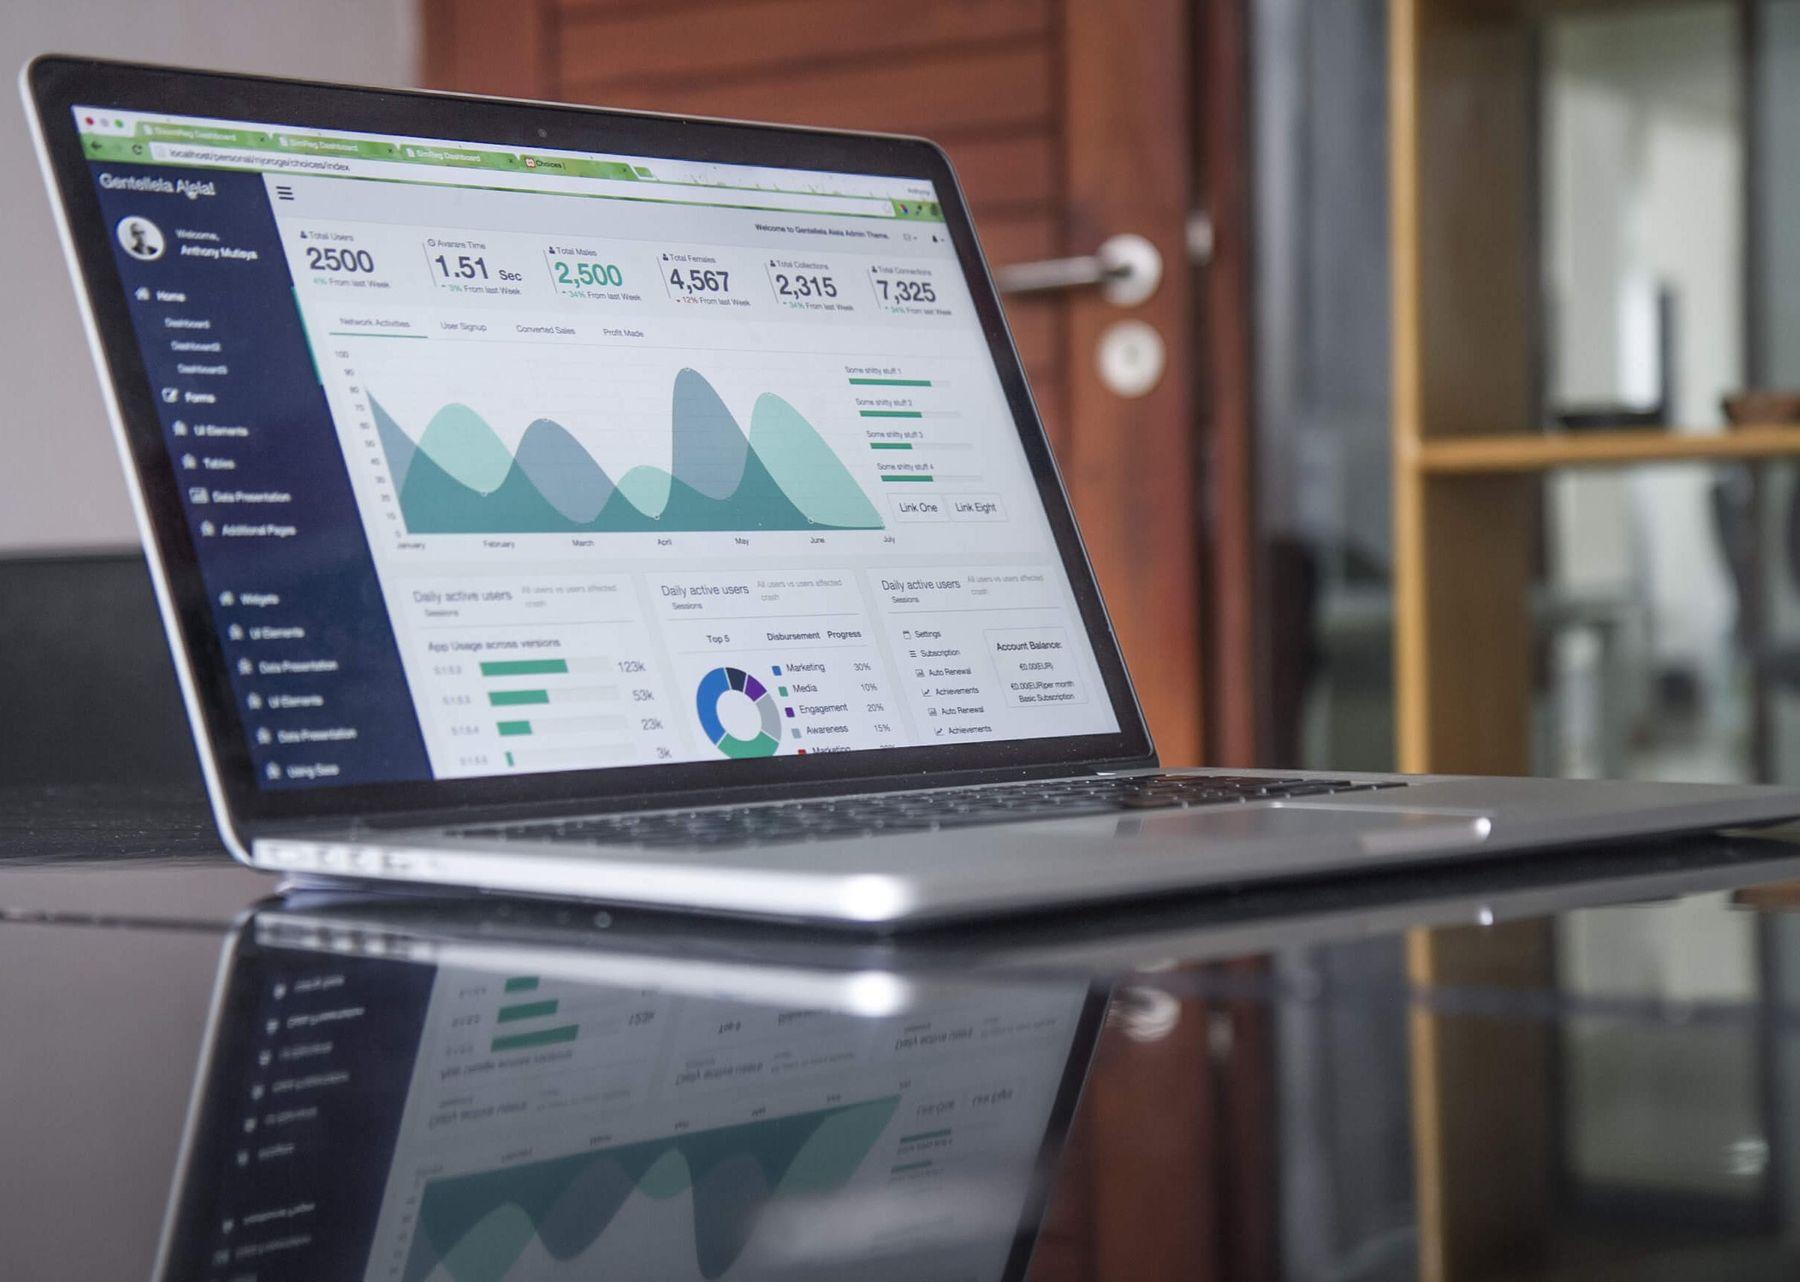 Practical Marketing Skills – image of a laptop